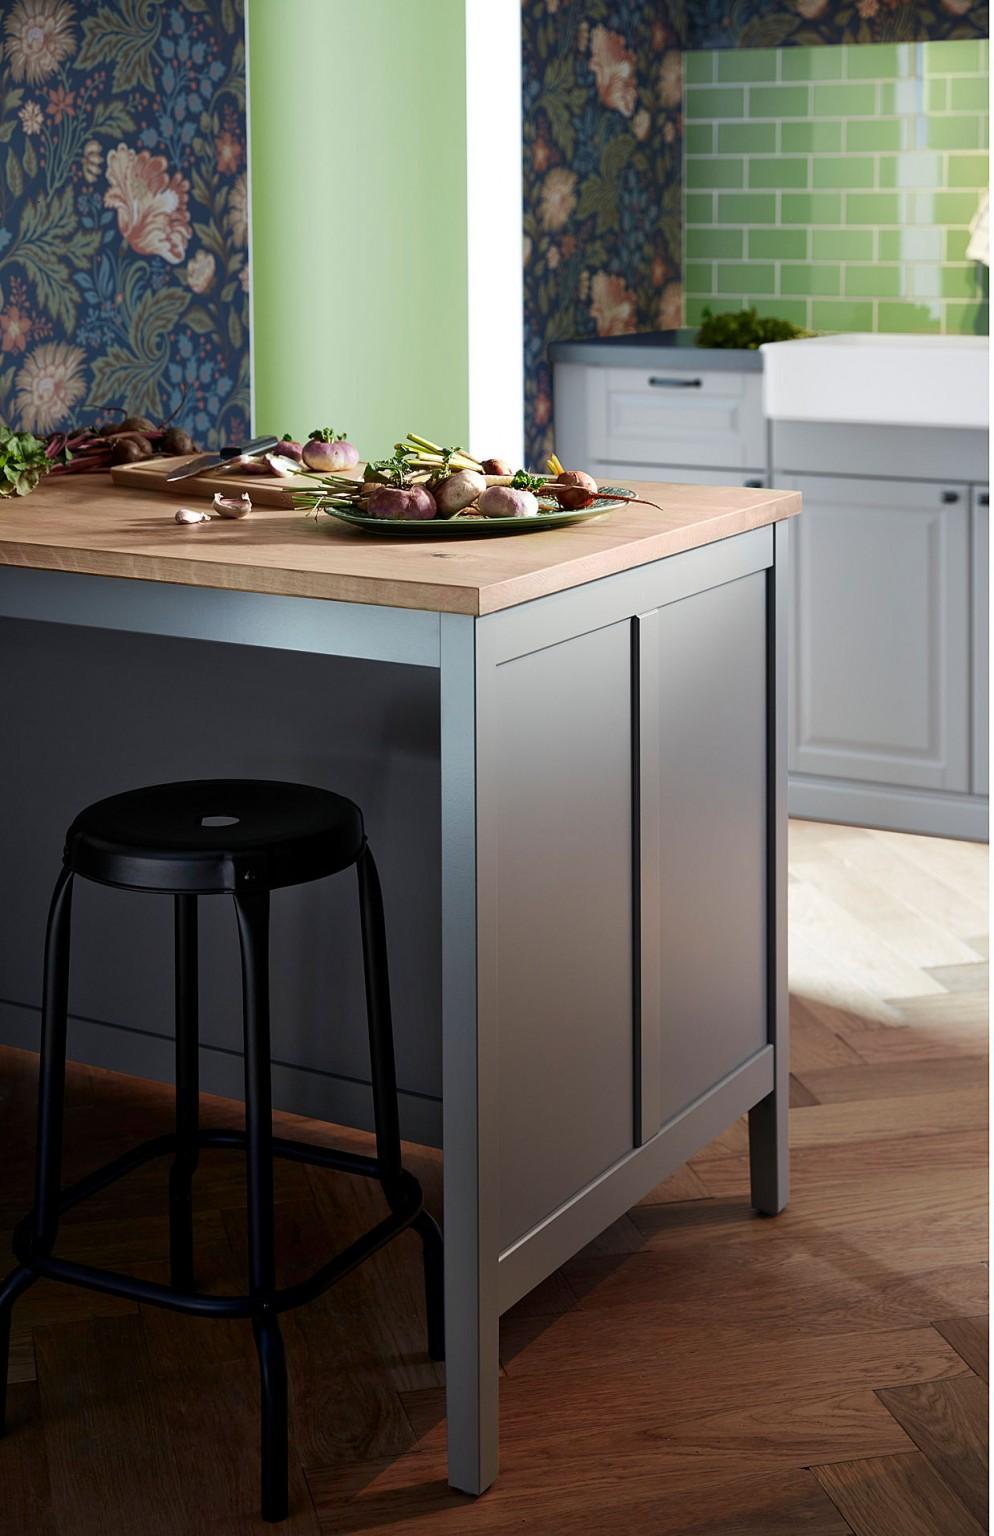 Le Cucine Ikea 2020 In Immagini Foto 1 Livingcorriere